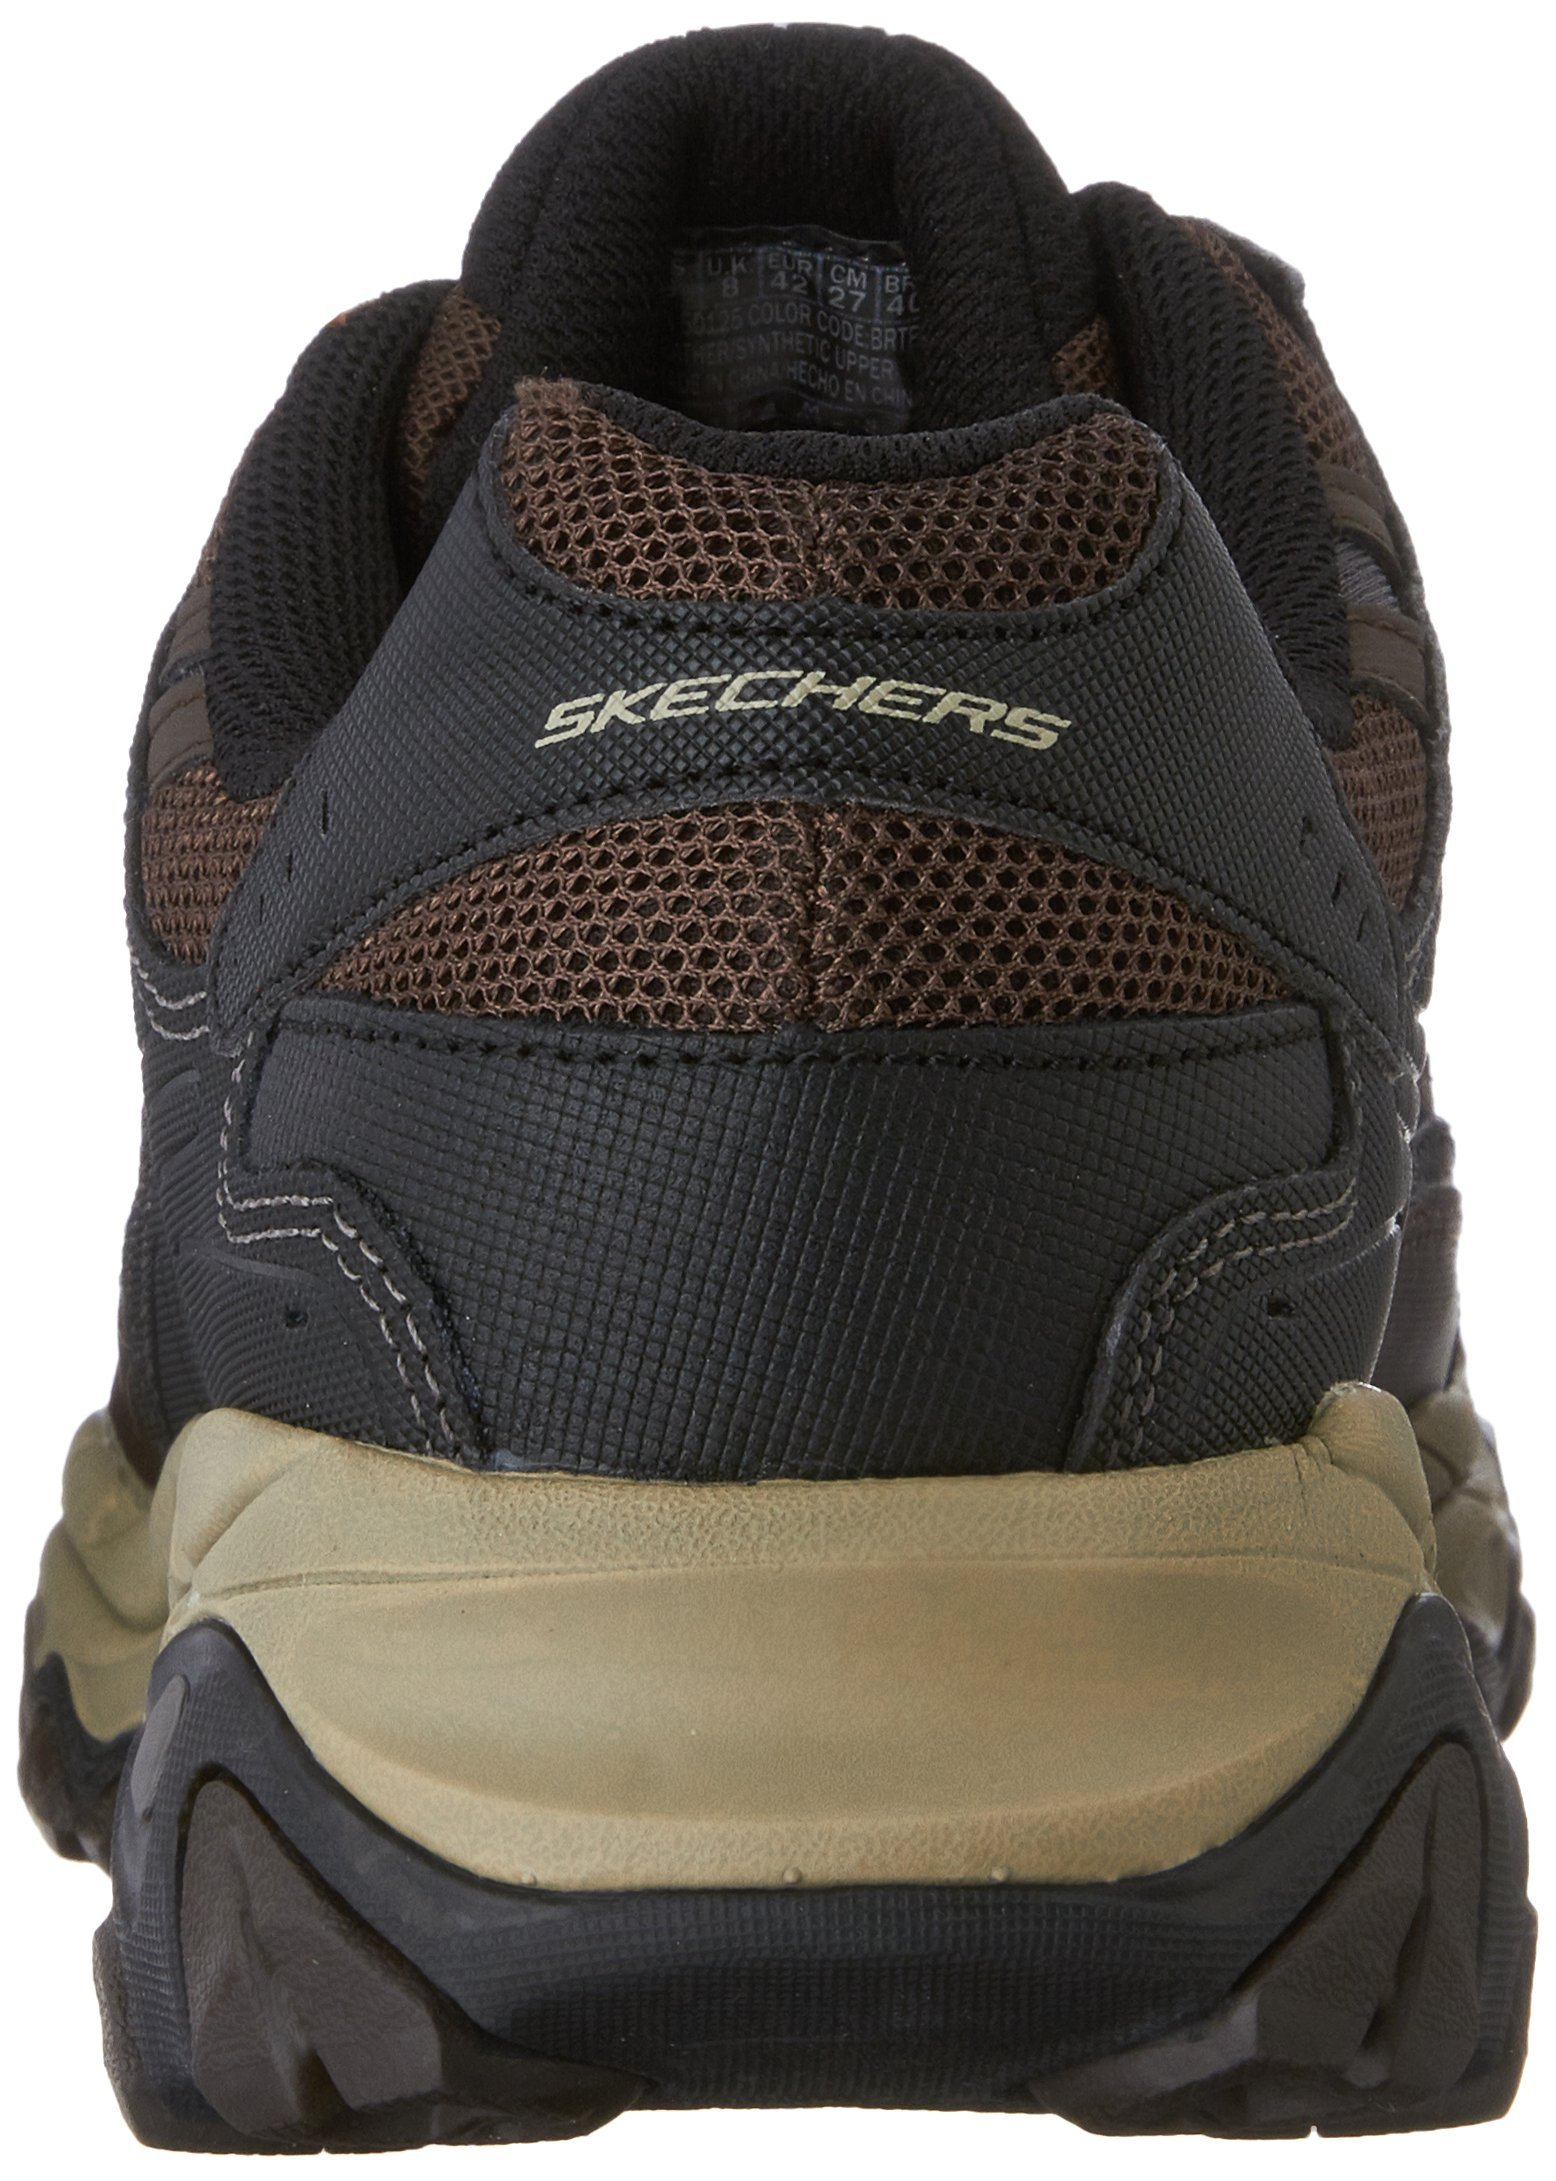 Skechers Men's AFTERBURNM.FIT Memory Foam Lace-Up Sneaker, Brown/Taupe, 7 M US by Skechers (Image #2)